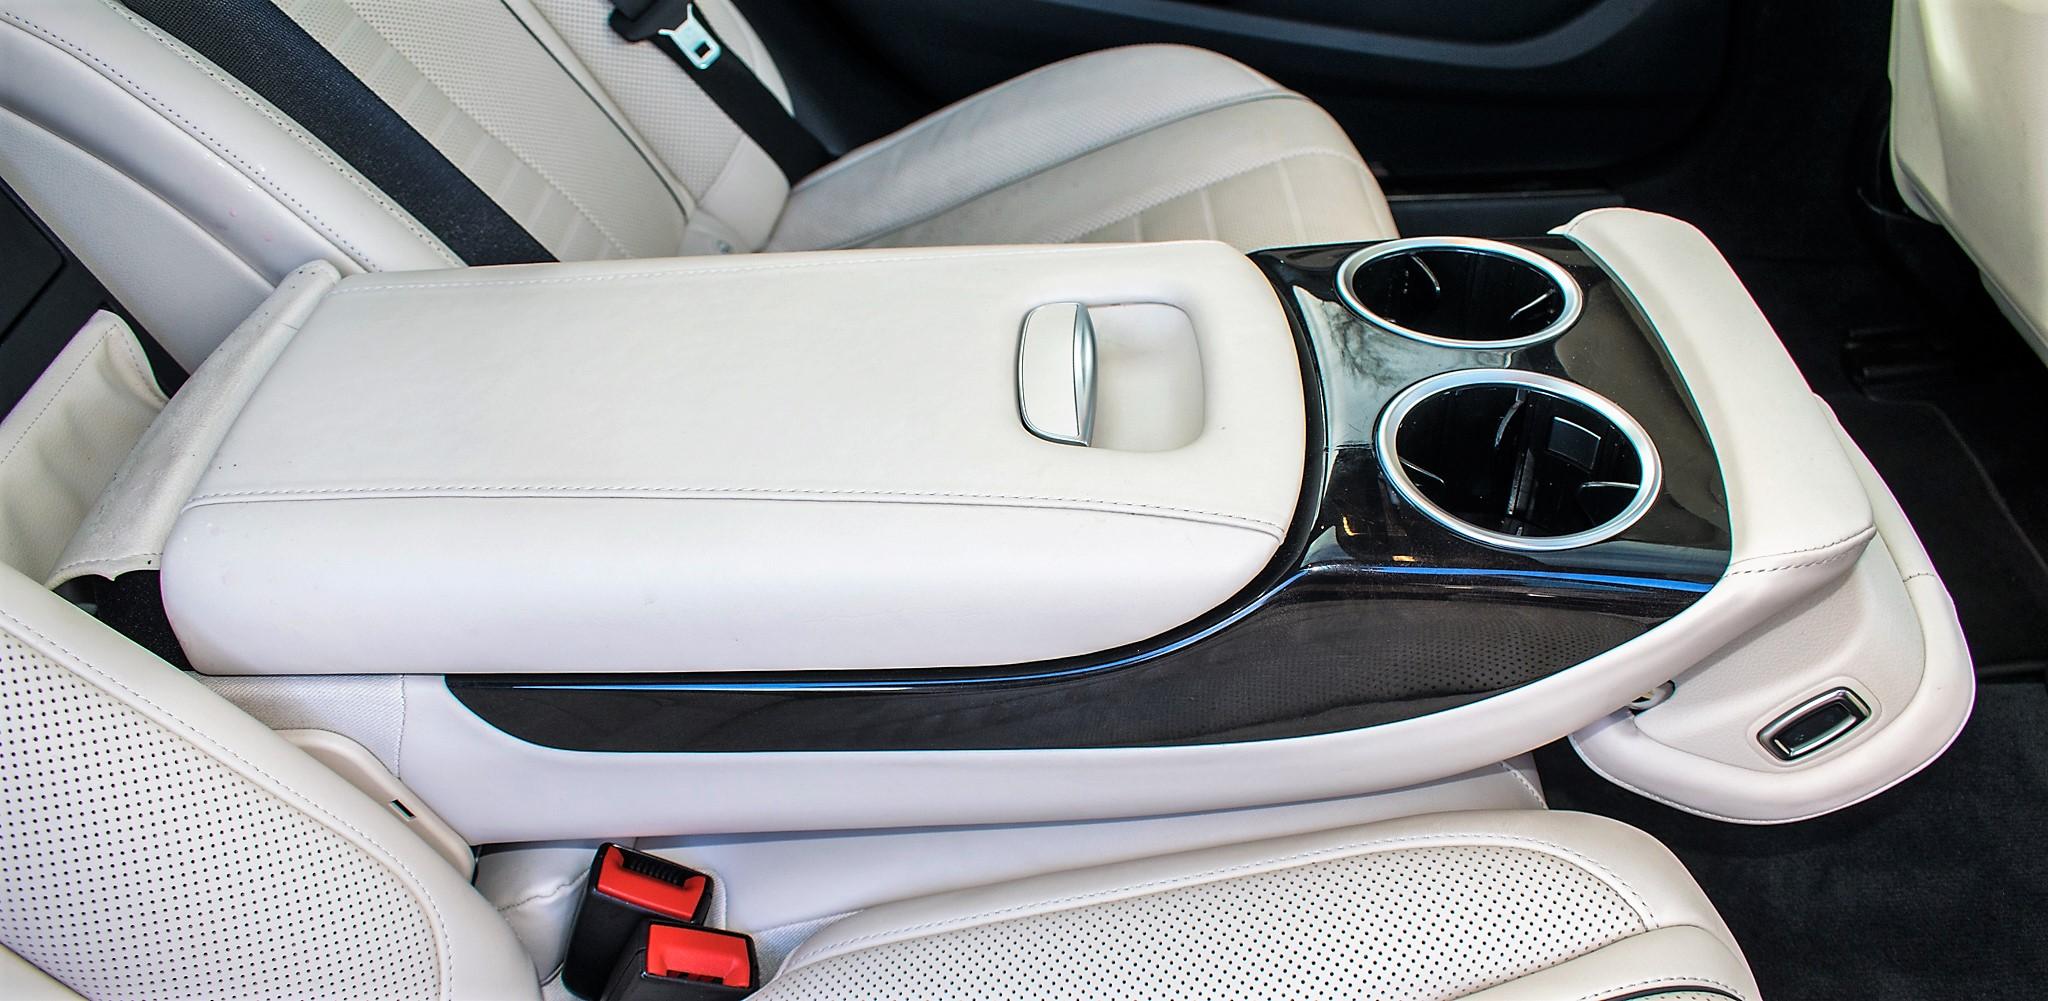 Mercedes Benz S450 L AMG Line Executive auto petrol 4 door saloon car Registration Number: FX68 - Image 26 of 30